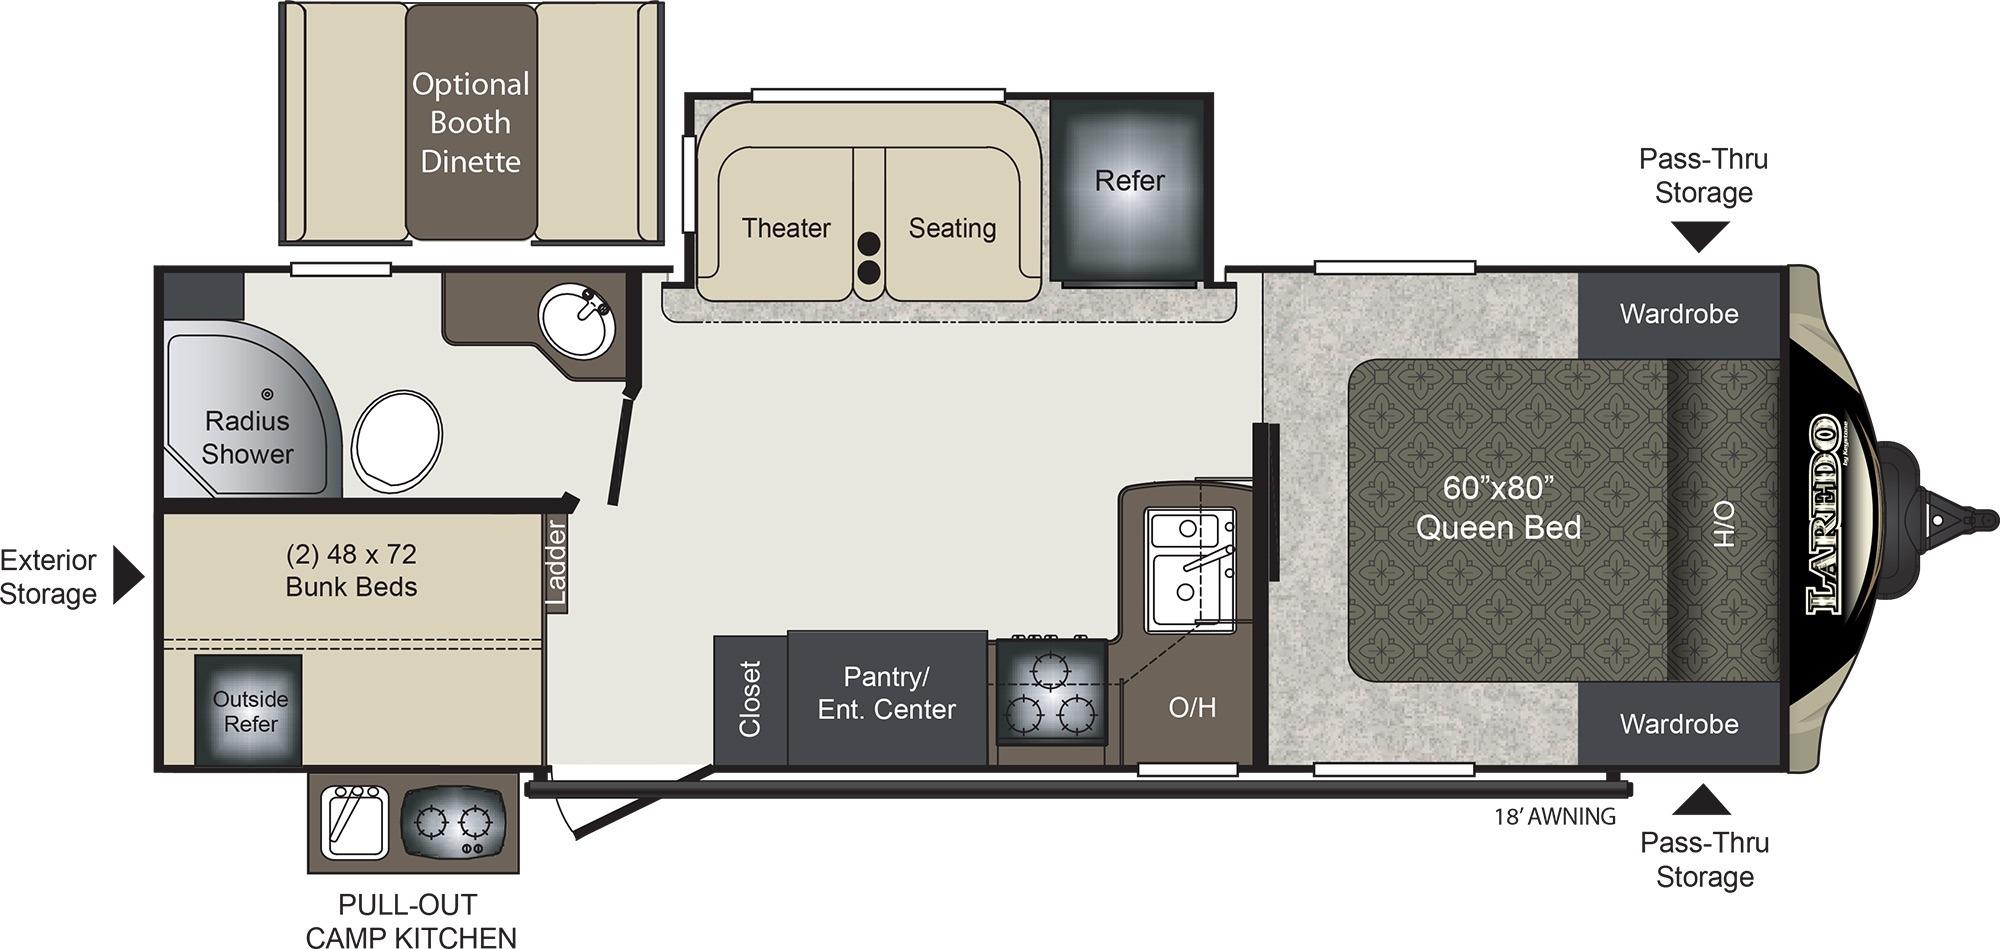 hight resolution of floor plan image